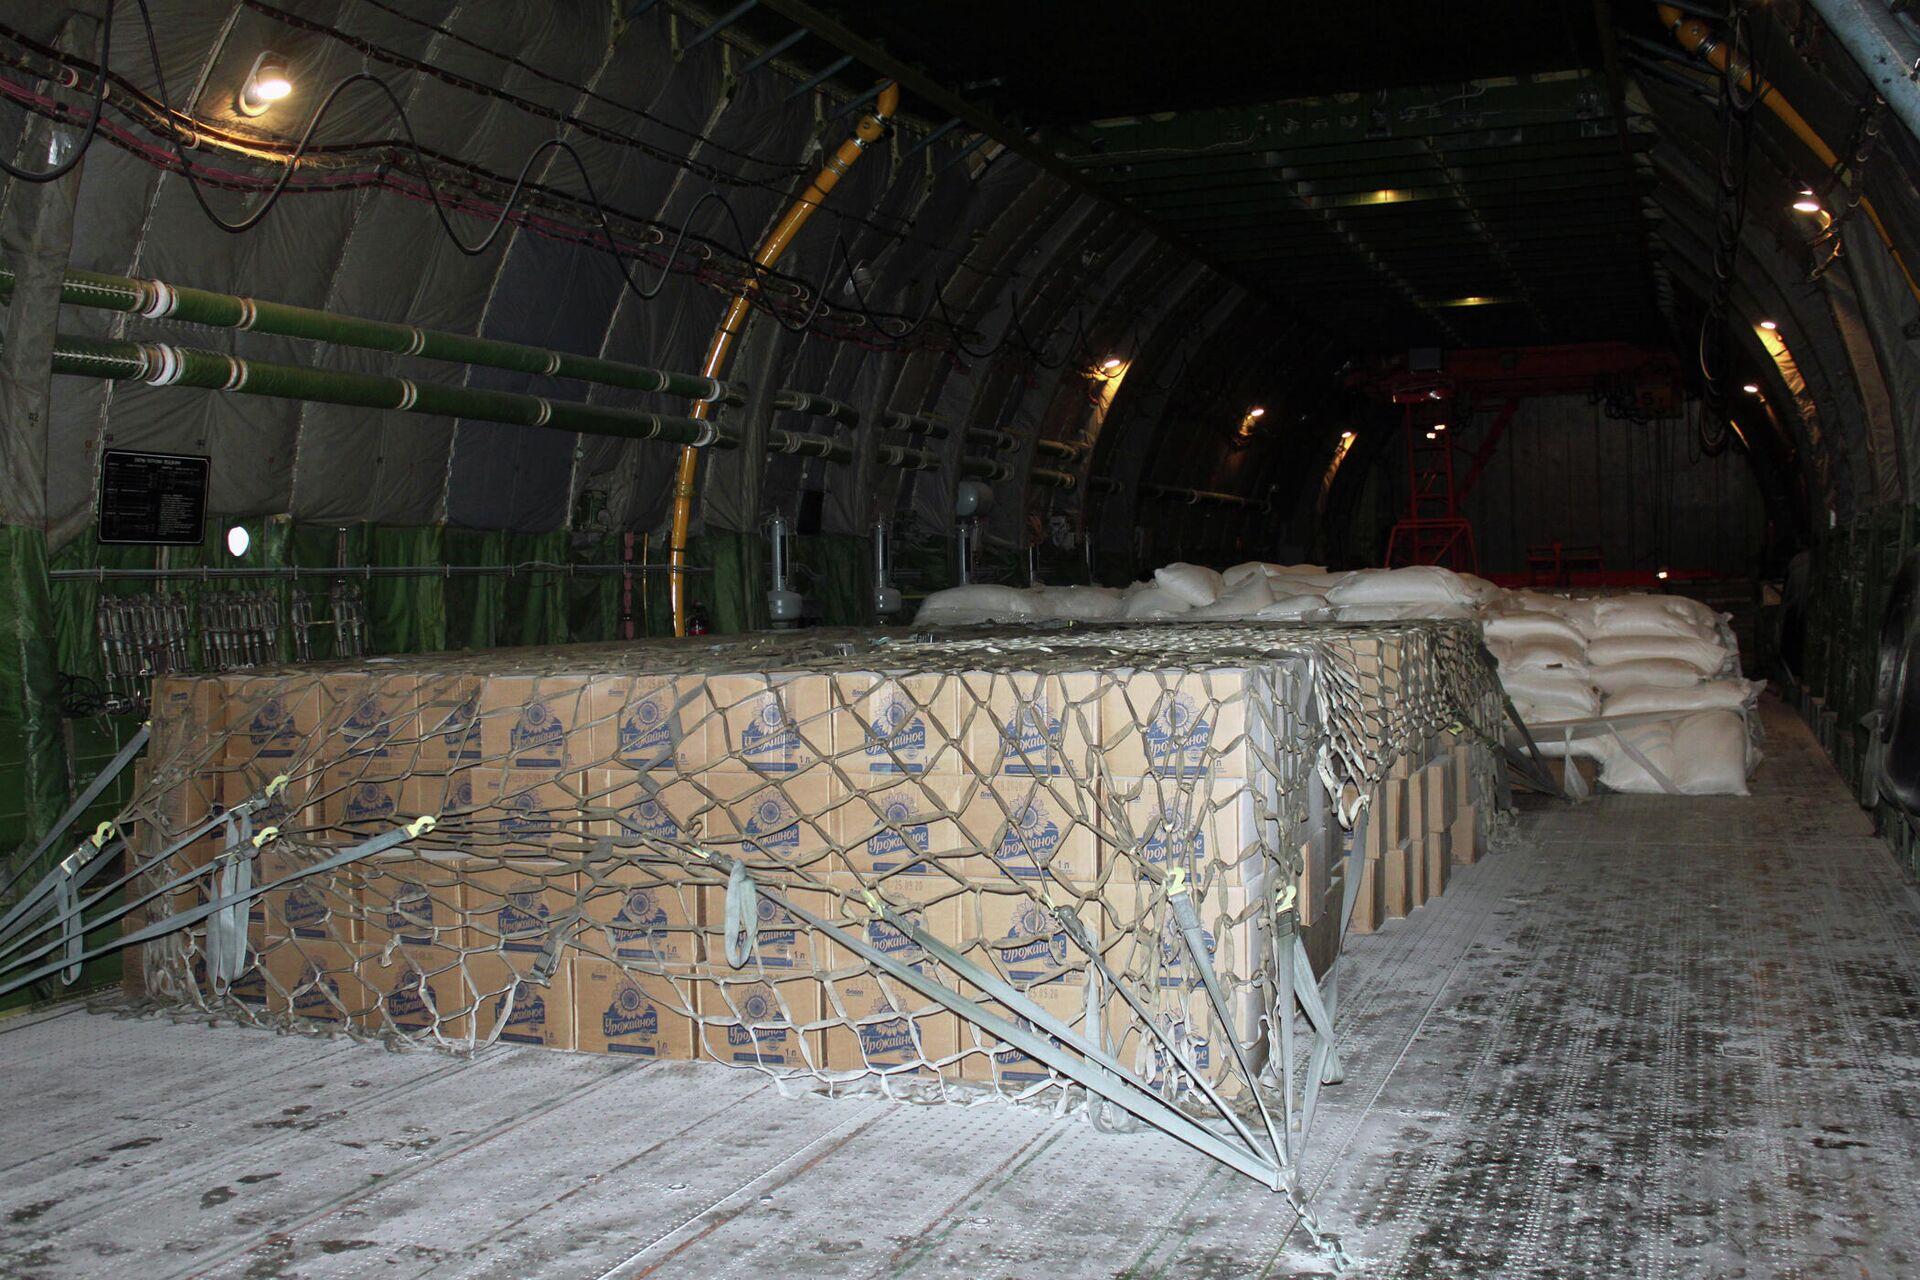 Interior del AN-124 que trasladó ayuda humanitaria a Cuba - Sputnik Mundo, 1920, 13.08.2021